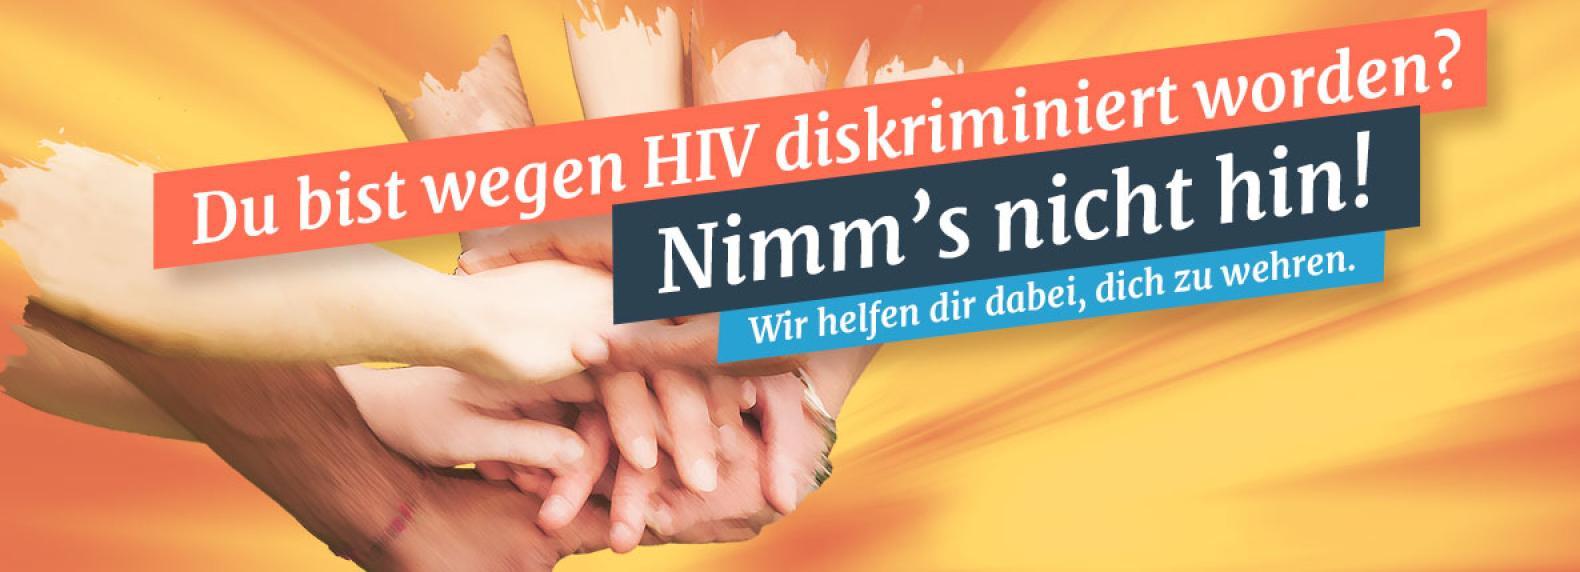 Portal hiv-diskriminierung